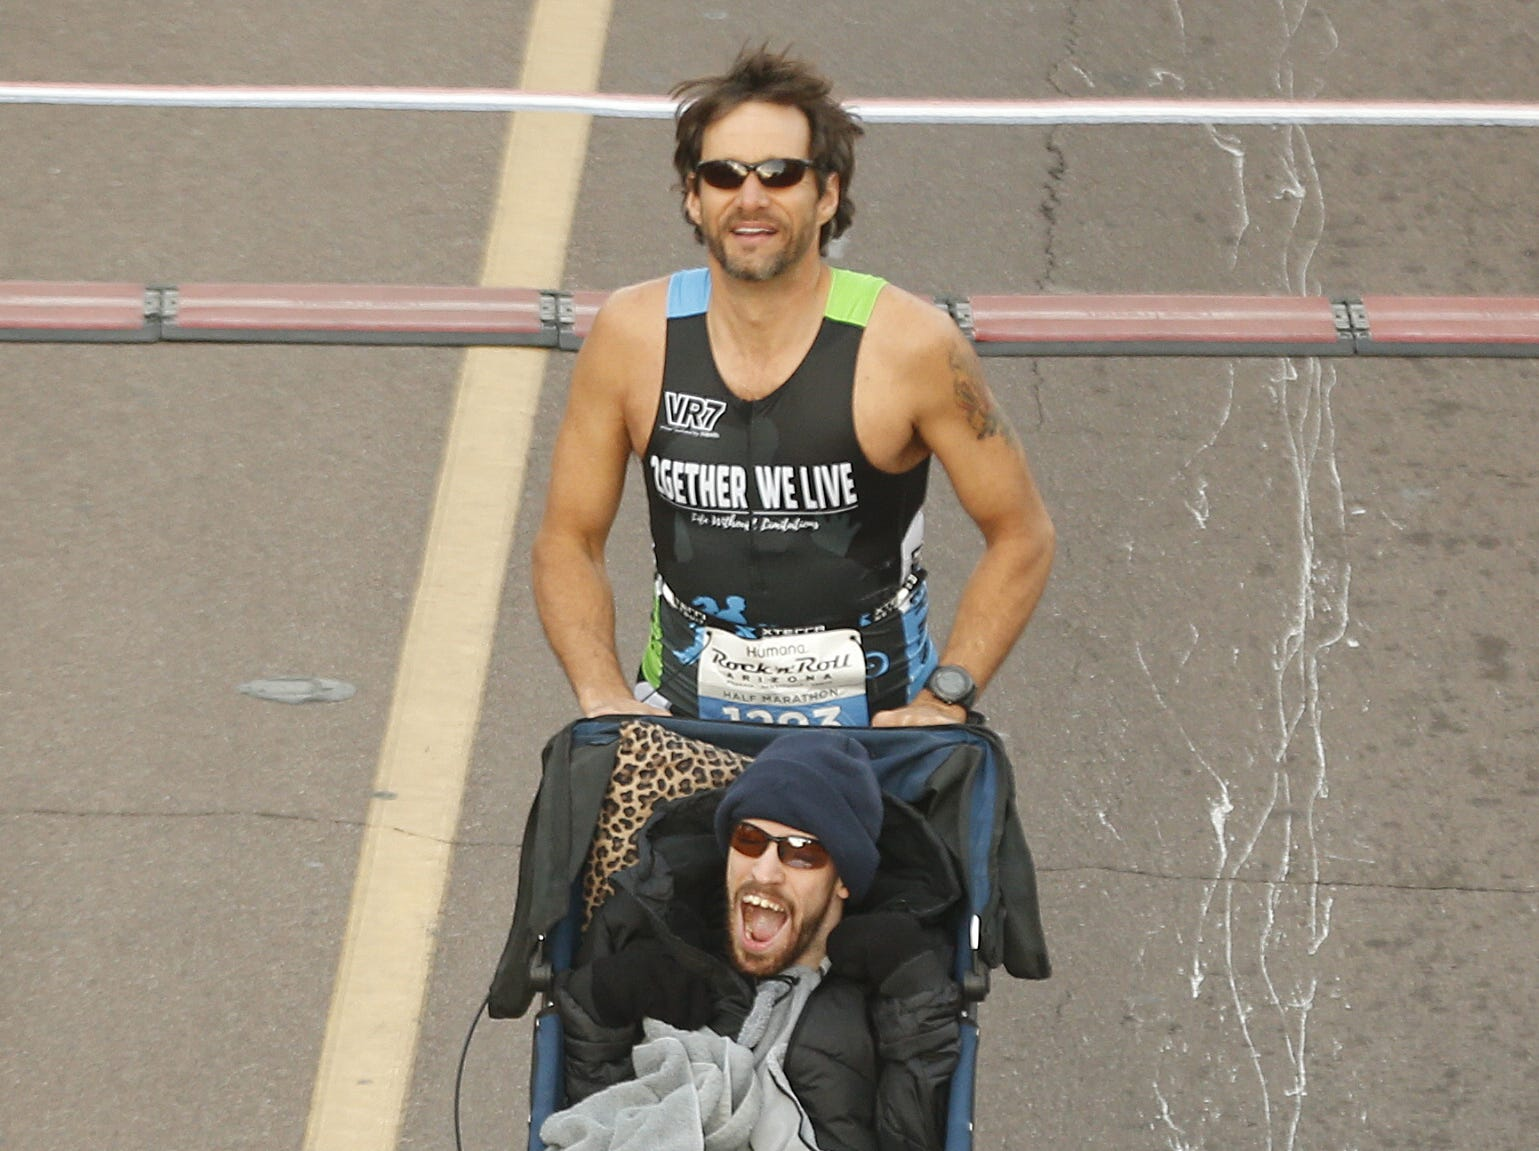 Matthew Reines pushes Patrick Canez at the start of the Rock 'N' Roll half-marathon in Tempe on Jan. 20, 2019.